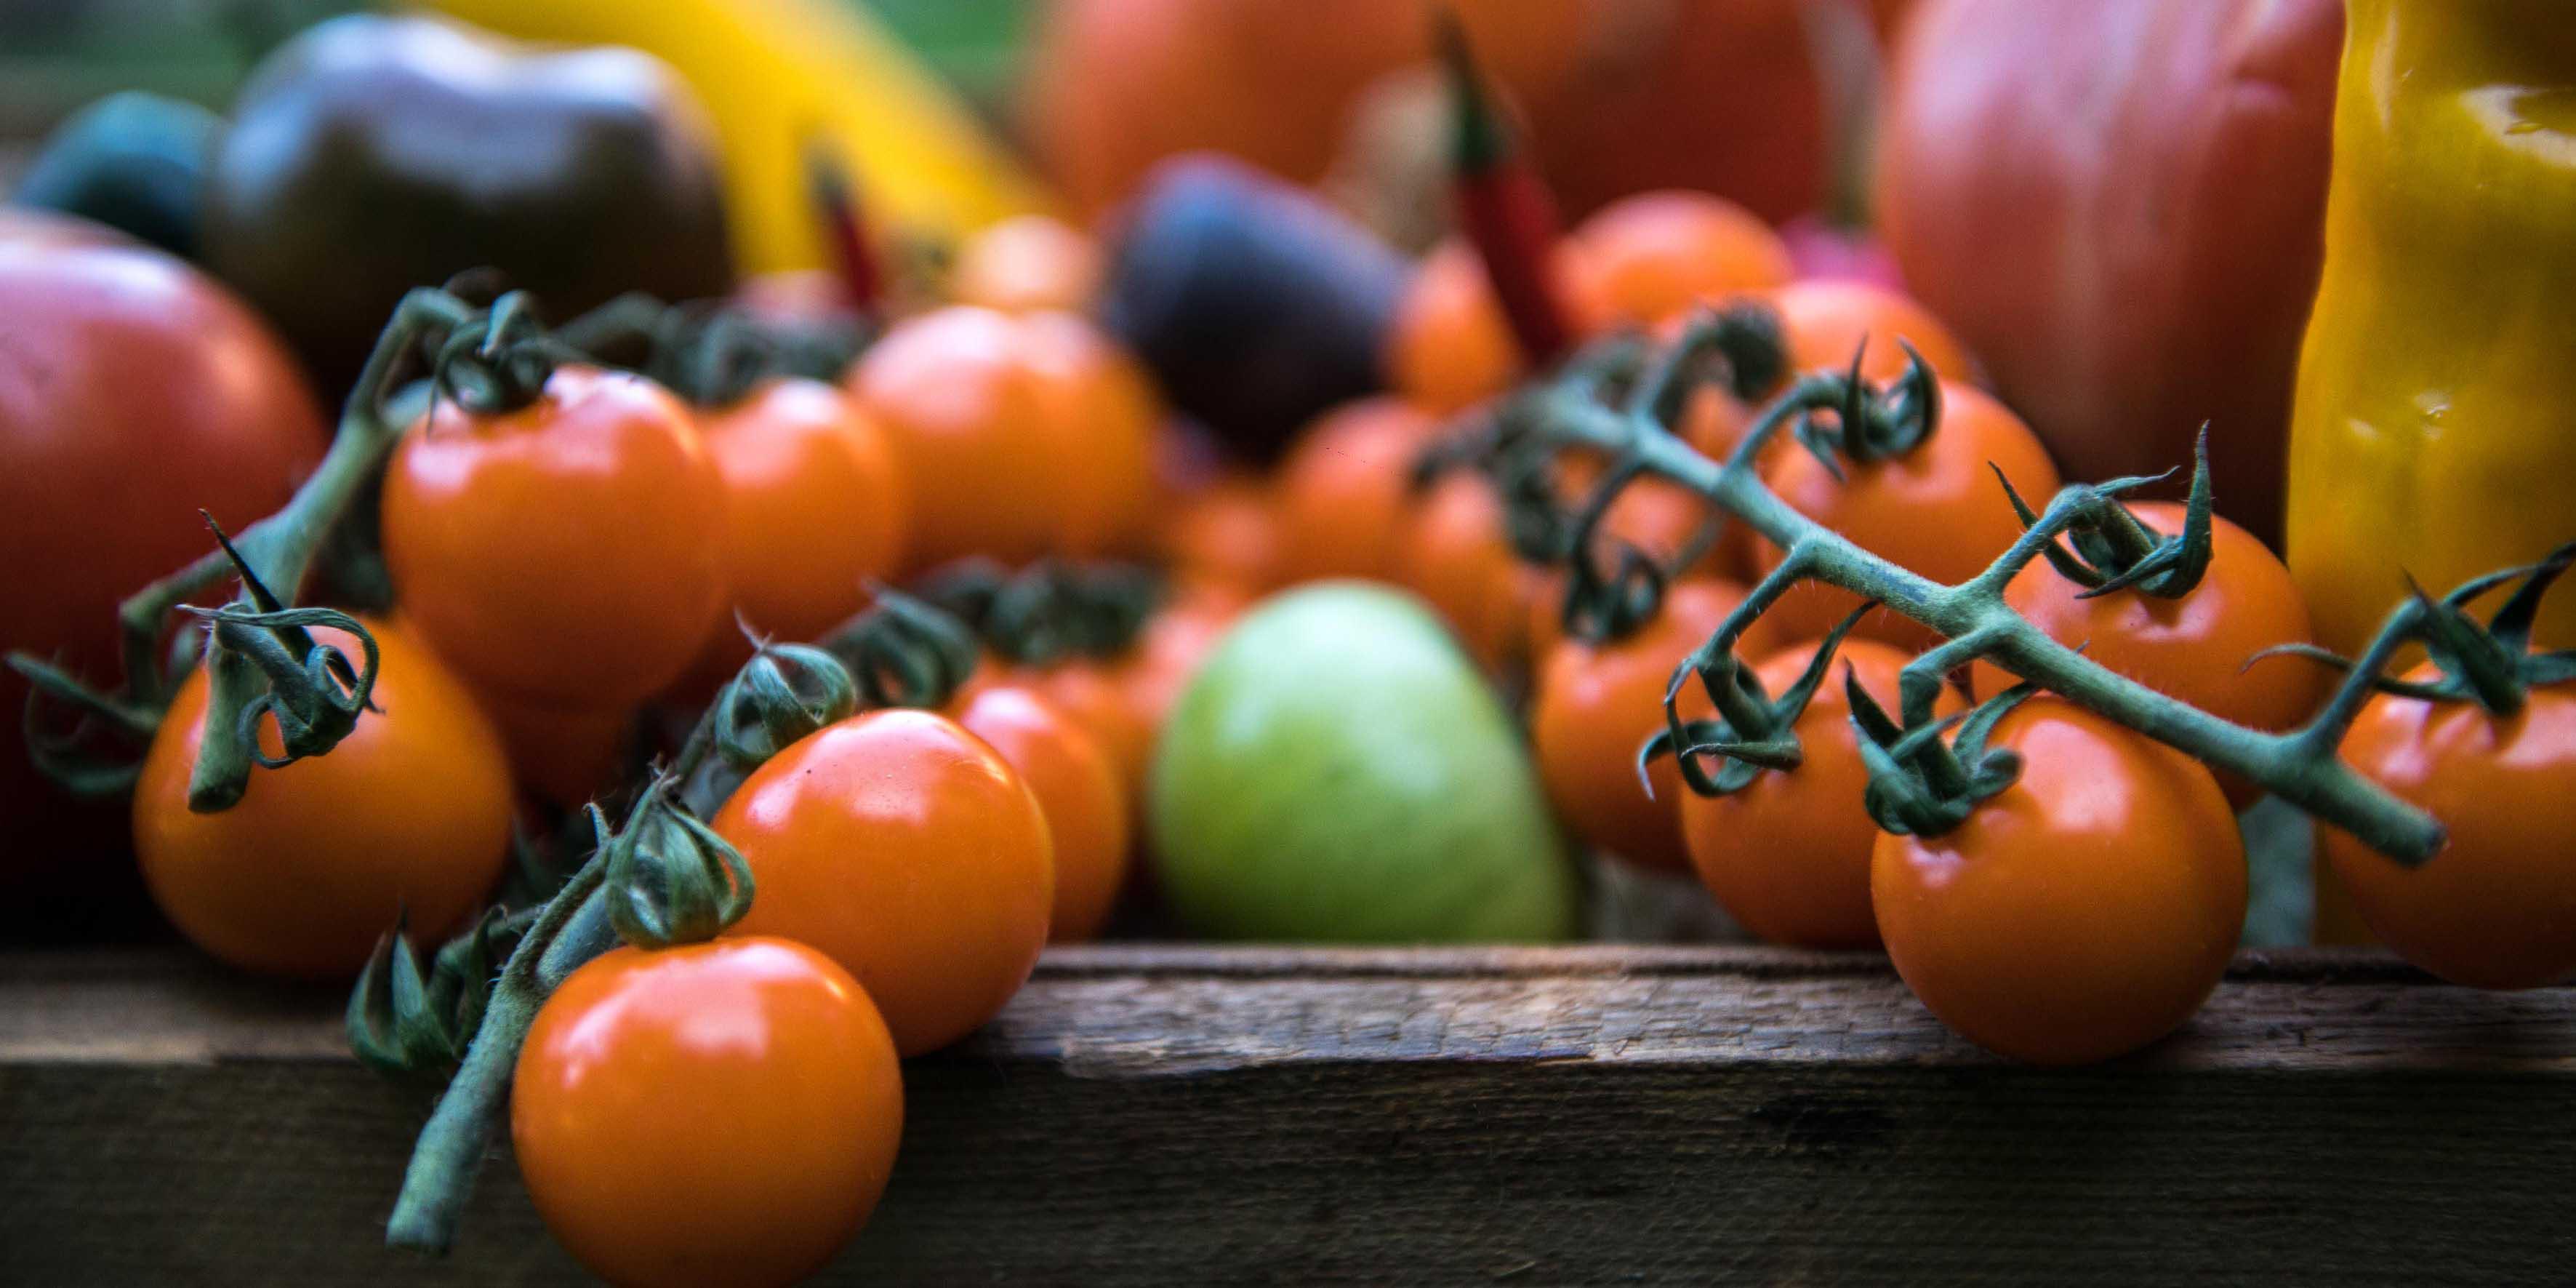 Walter Klunker - Gemüse